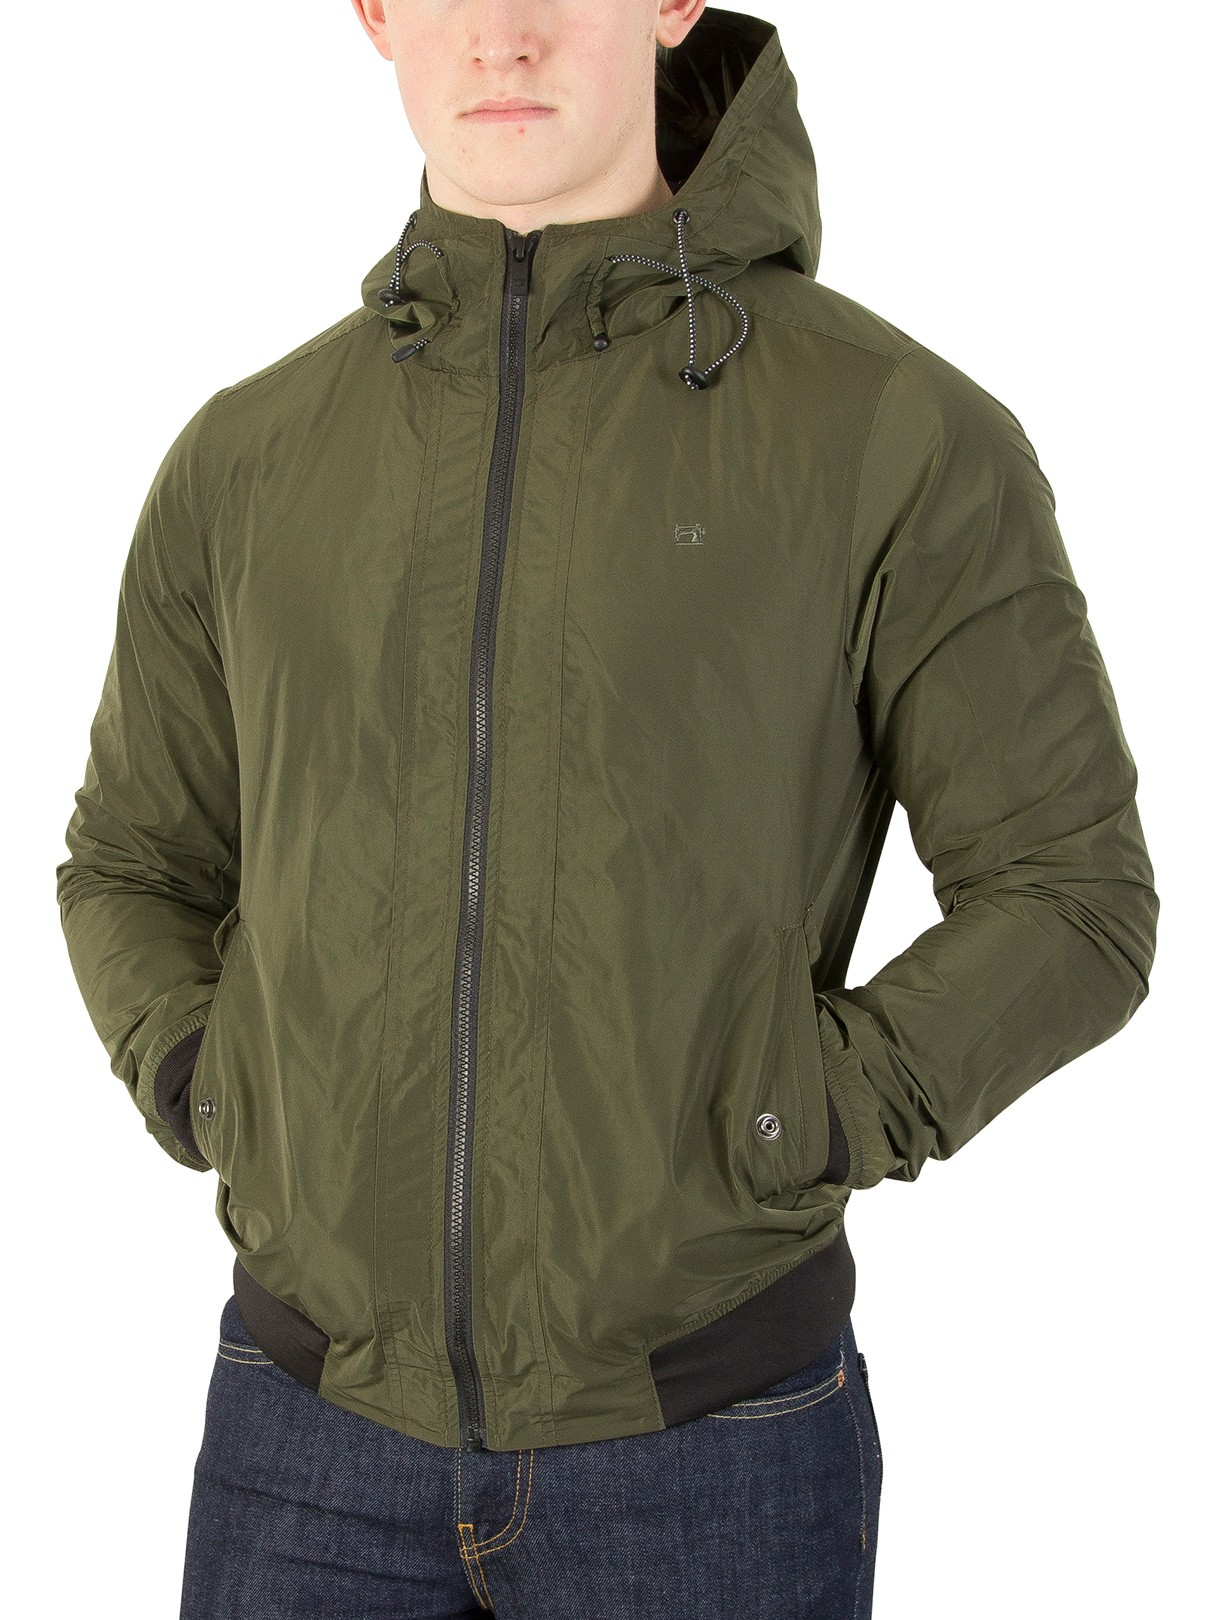 Leather Jackets & Coats|Men's Scotch & Soda Military Short Hooded Jacket